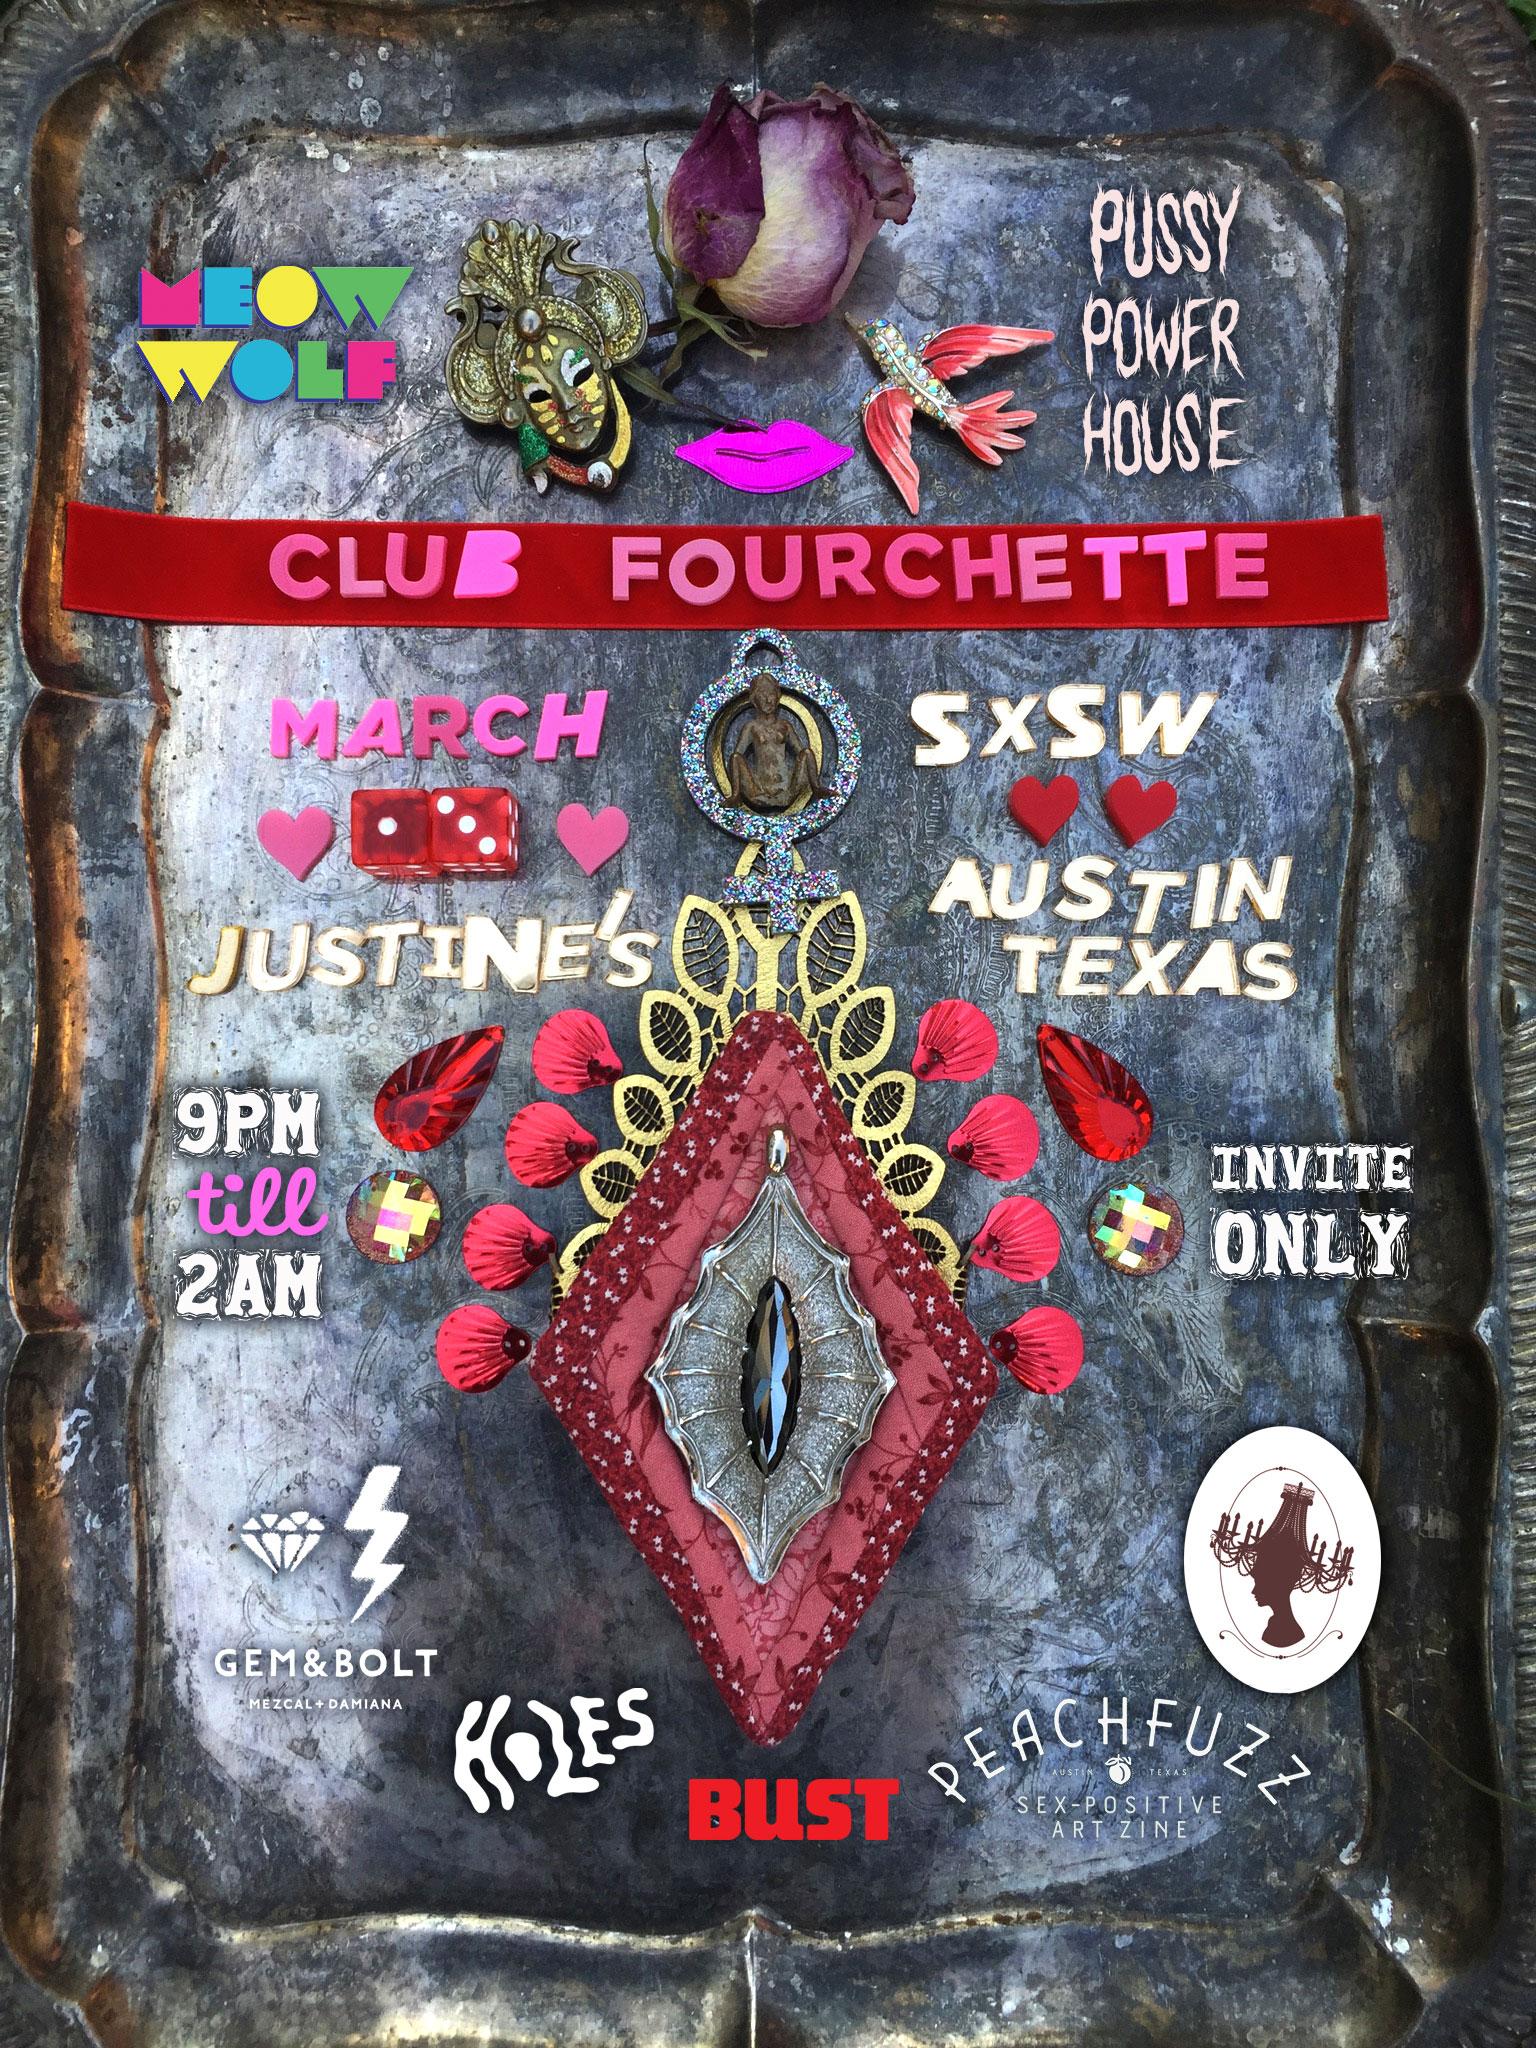 club_fourchette_poster_3-13-2018.jpg